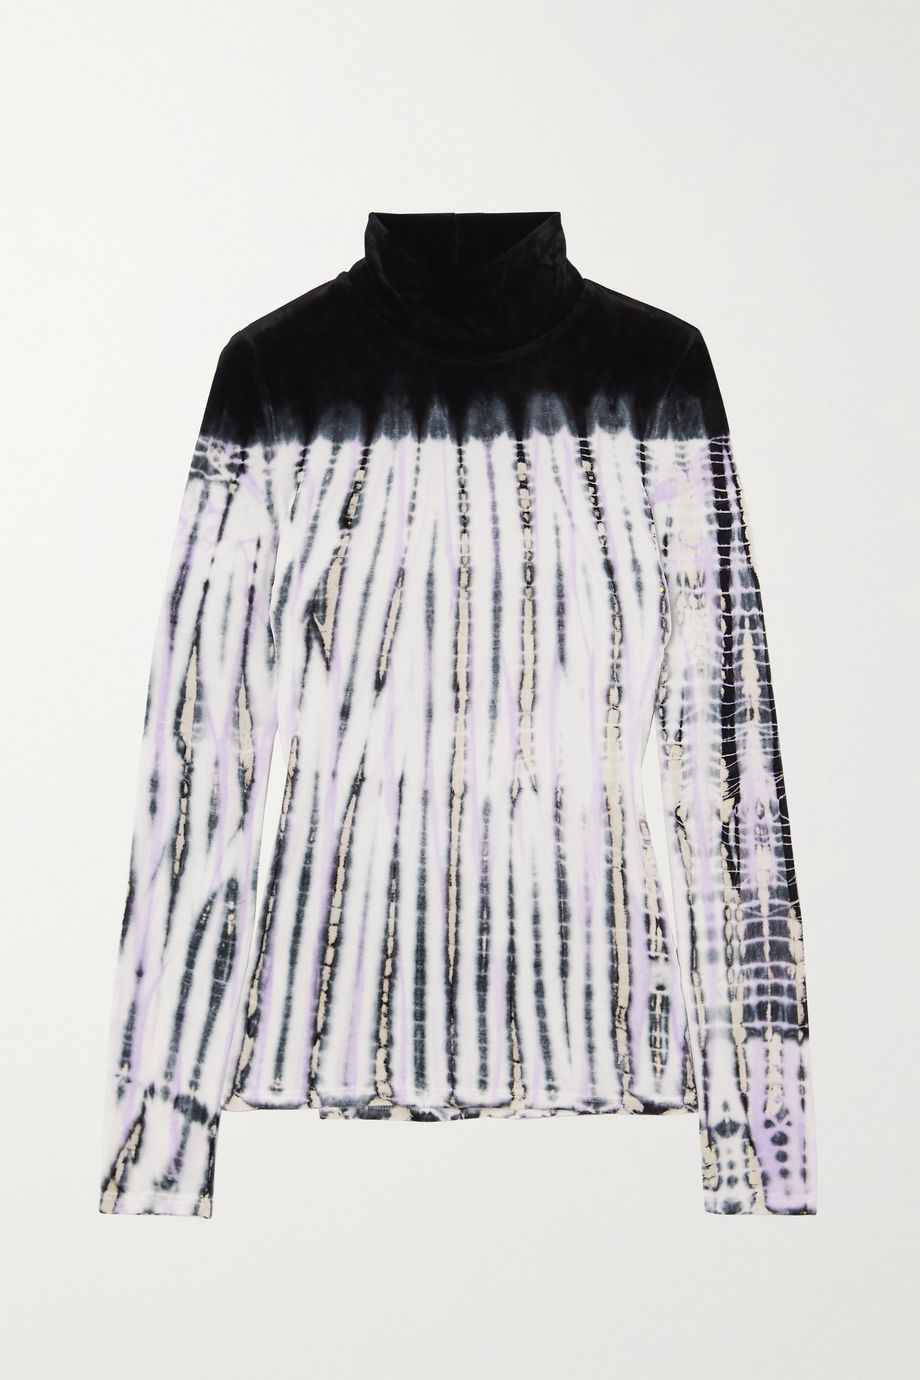 Proenza Schouler Haut à col montant en velours tie & dye